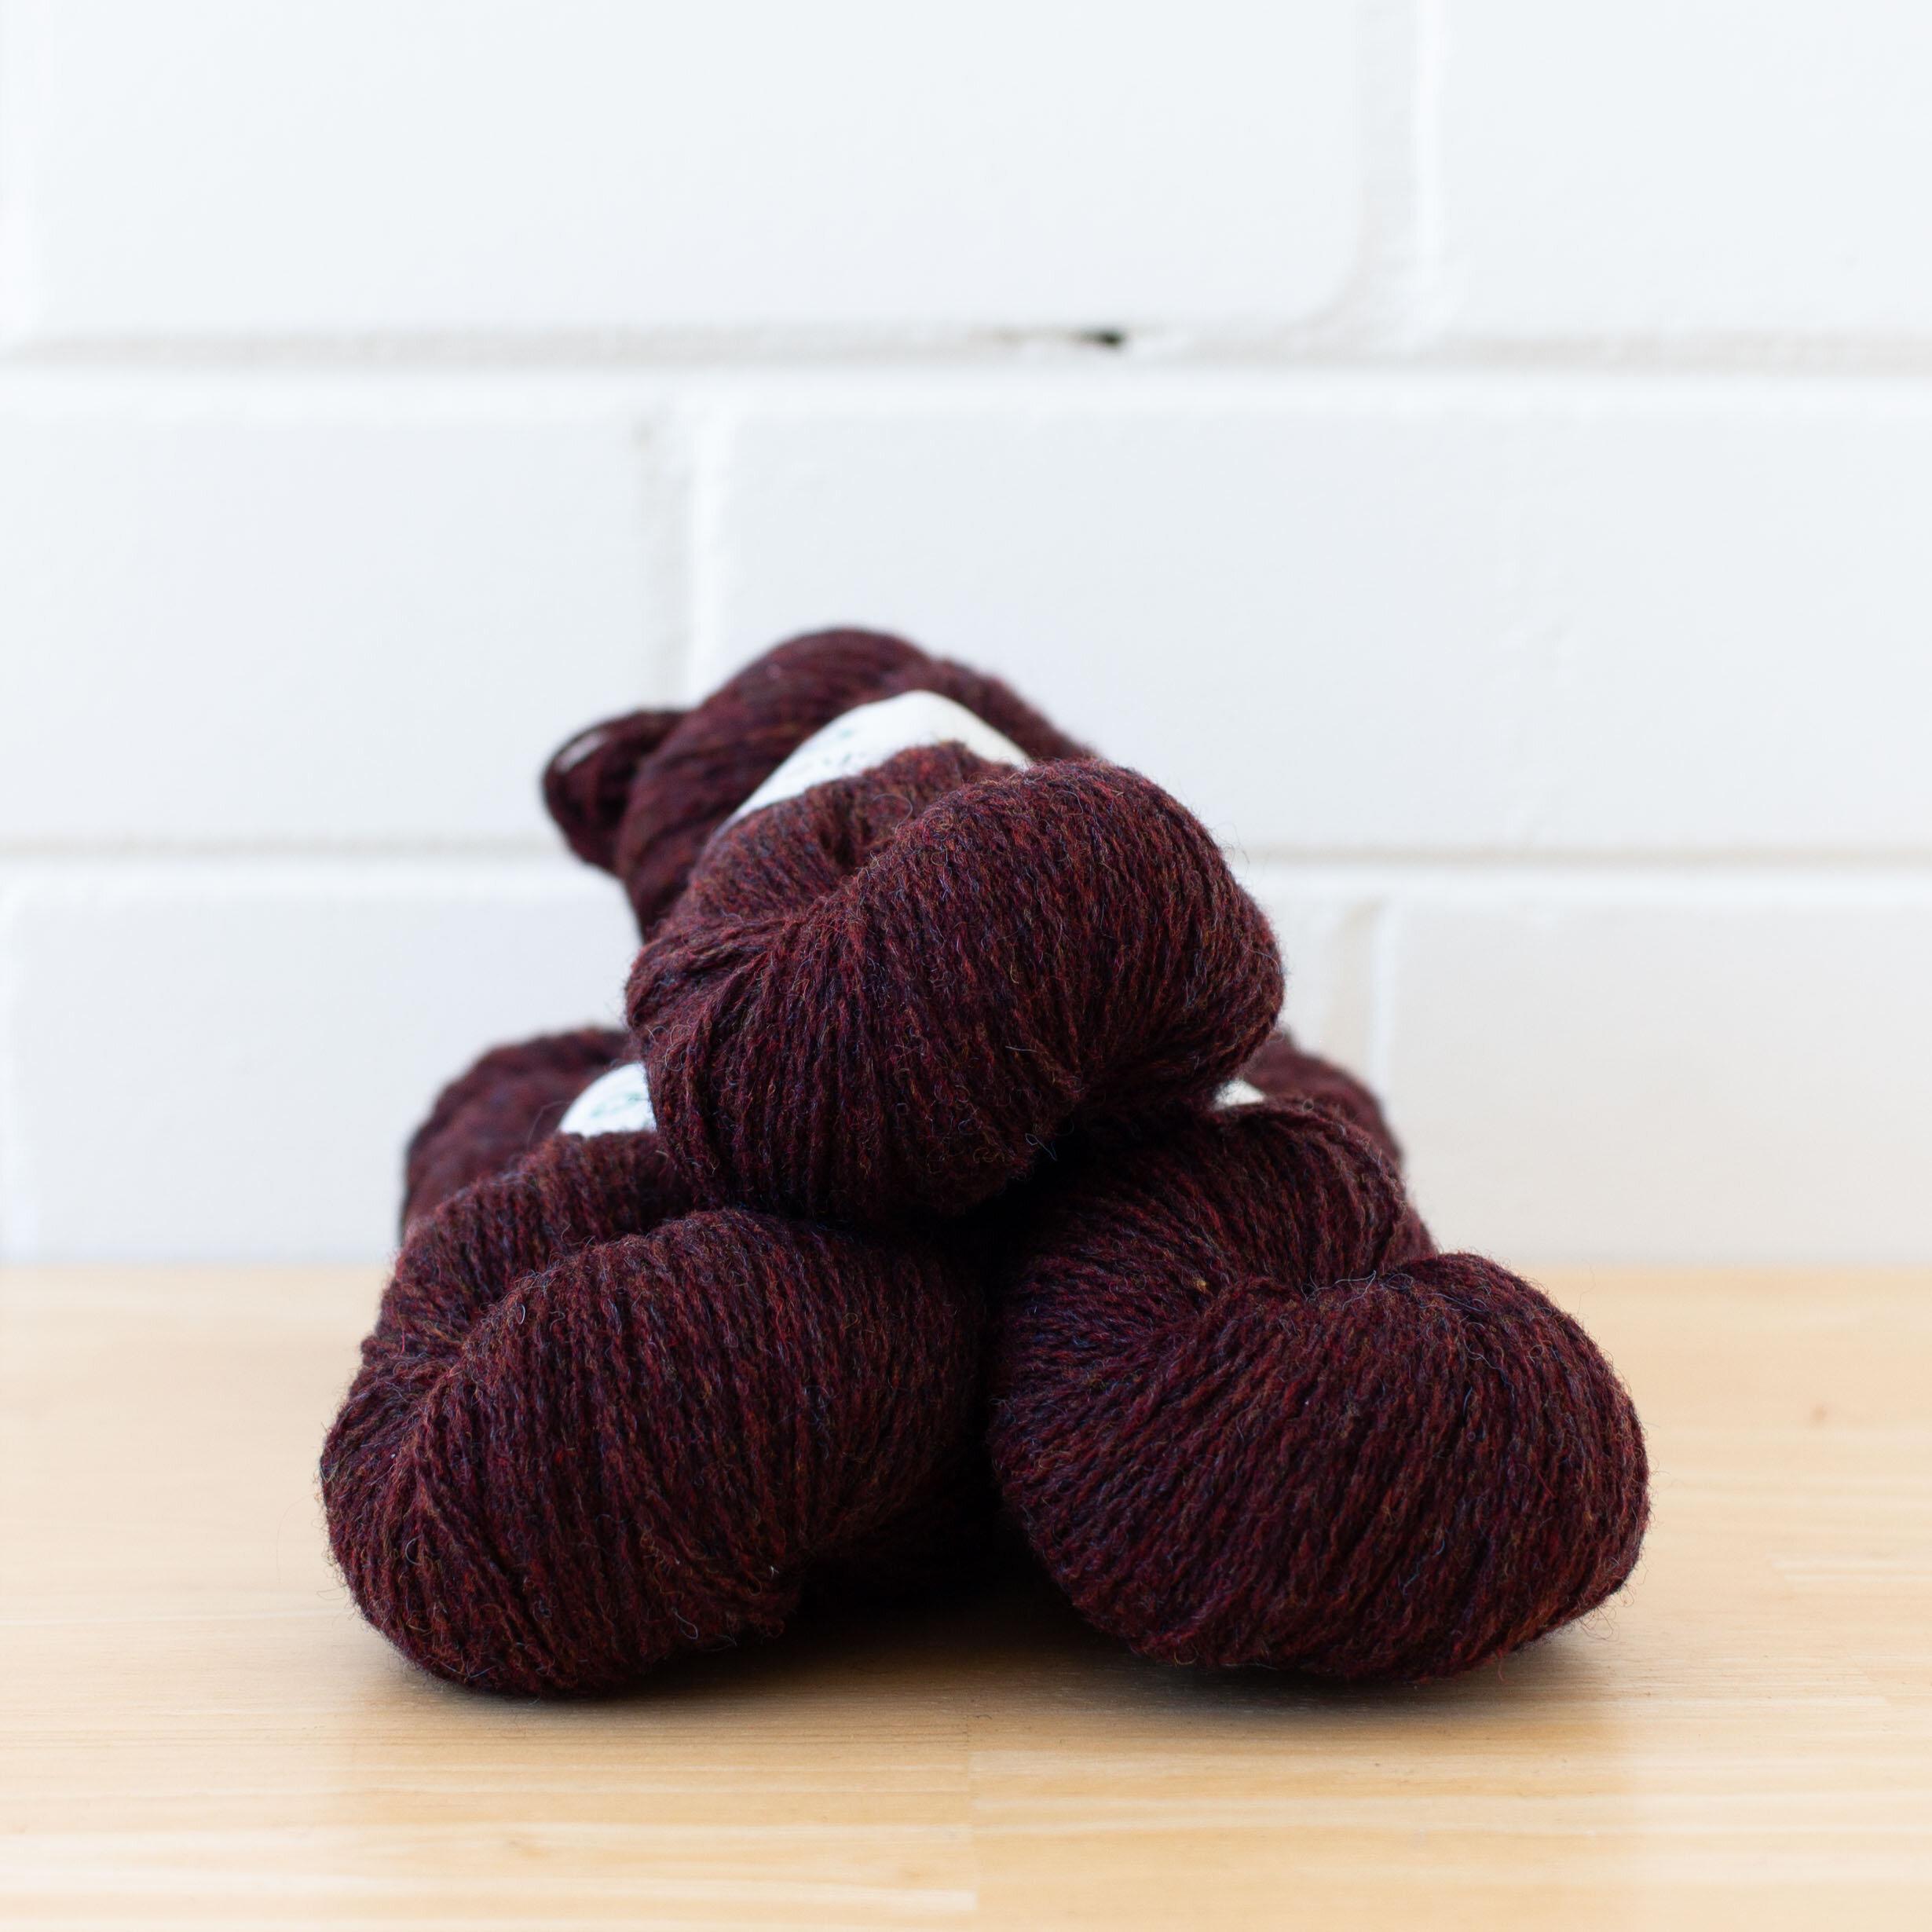 Copper Black Brown Fiber Stitch Marker Size 10 Needles Tiger Eye Wool Knitting